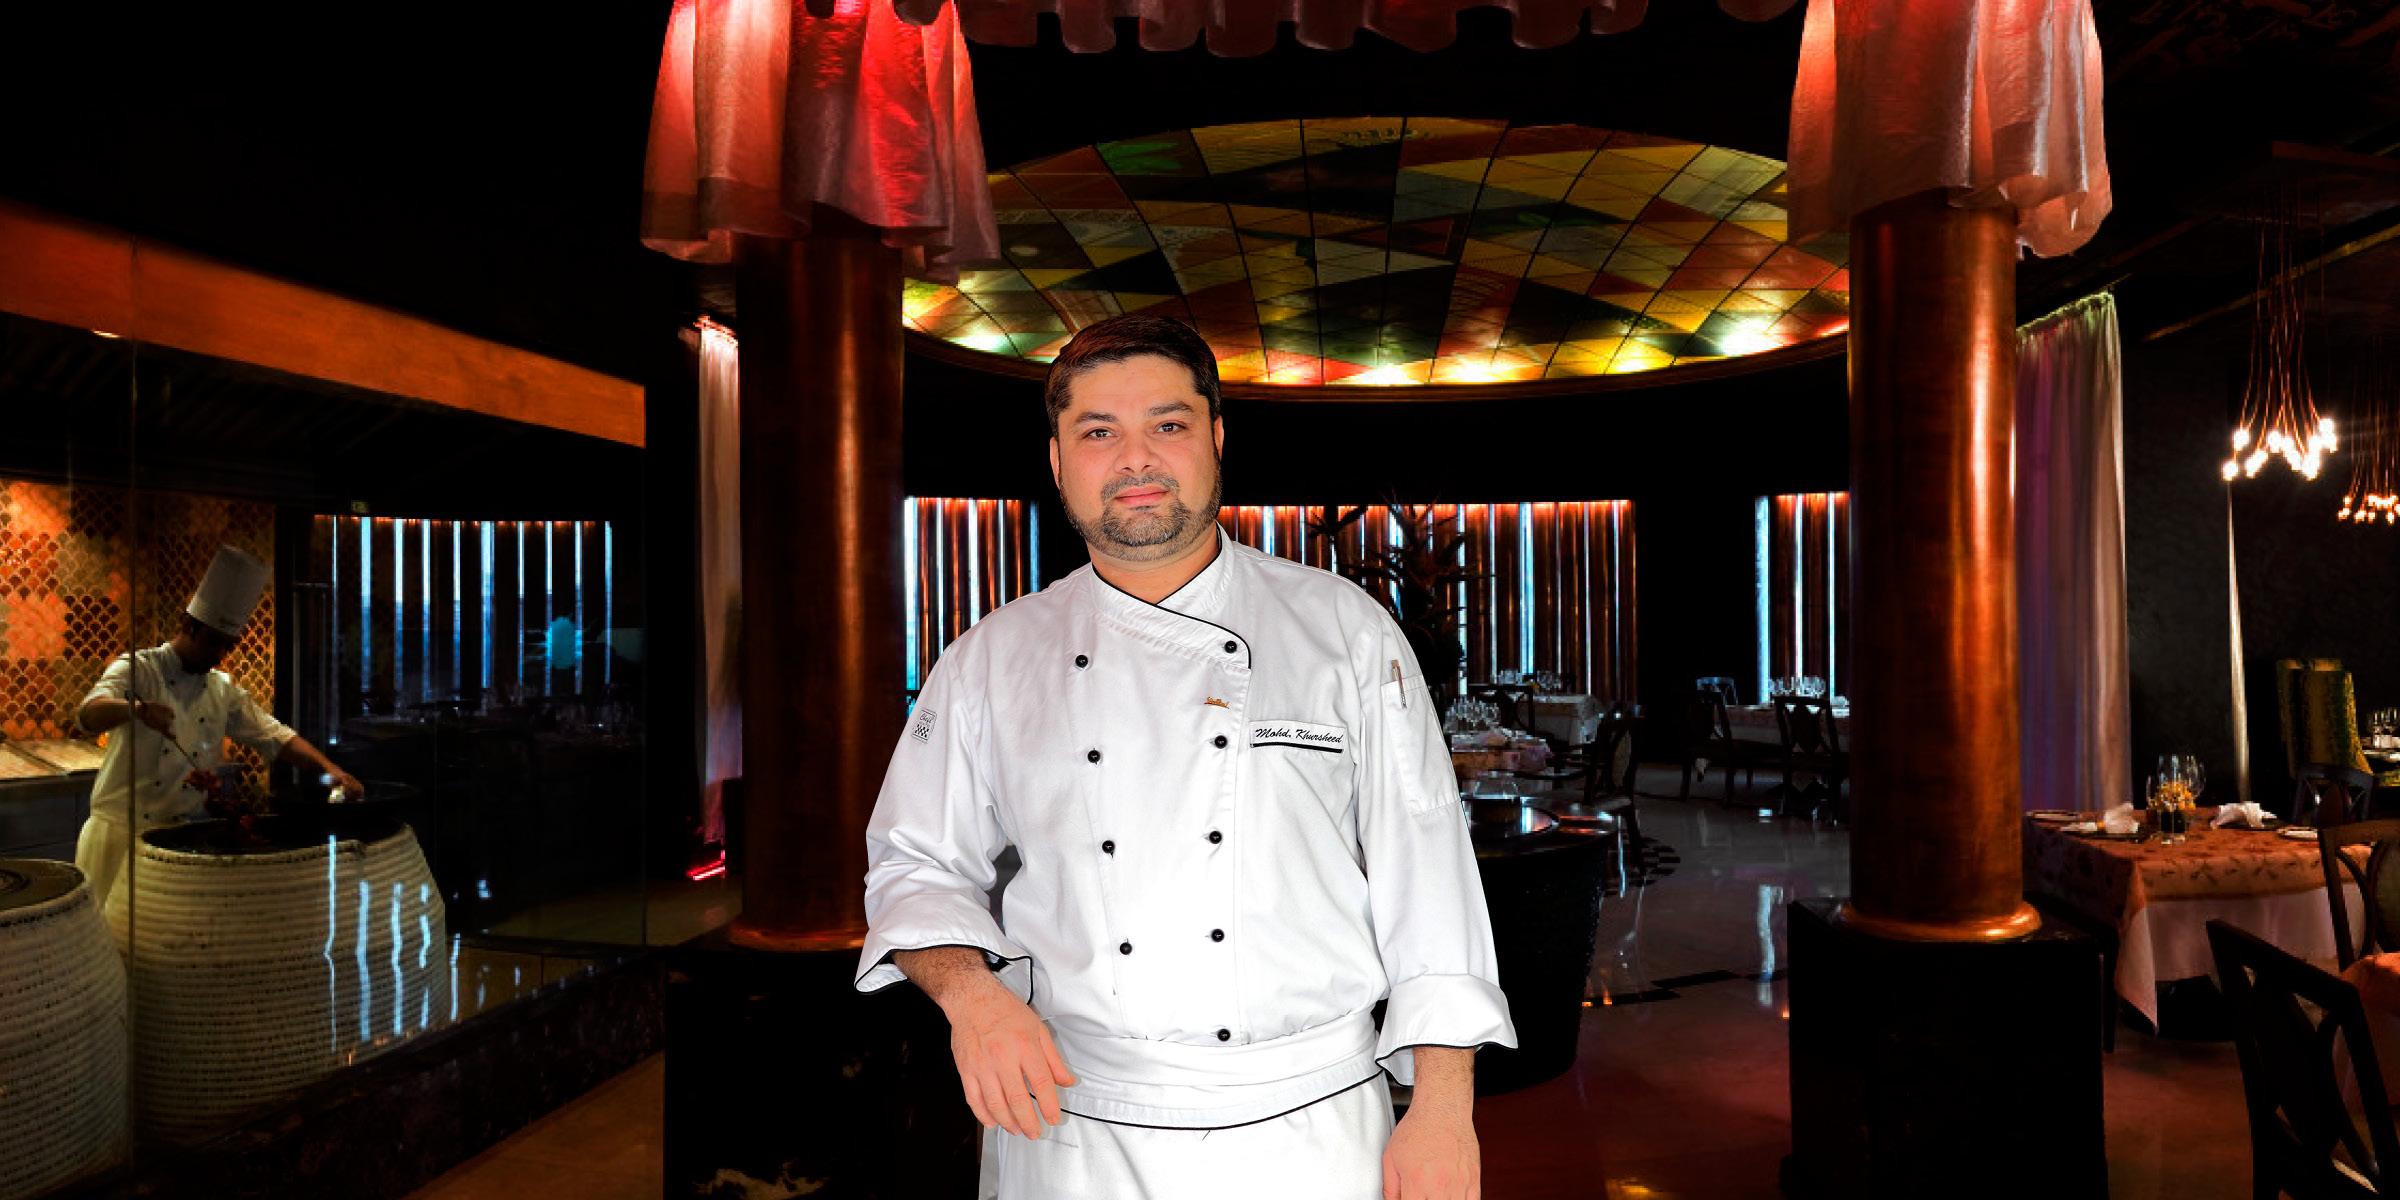 Chef Mohammad Khursheed